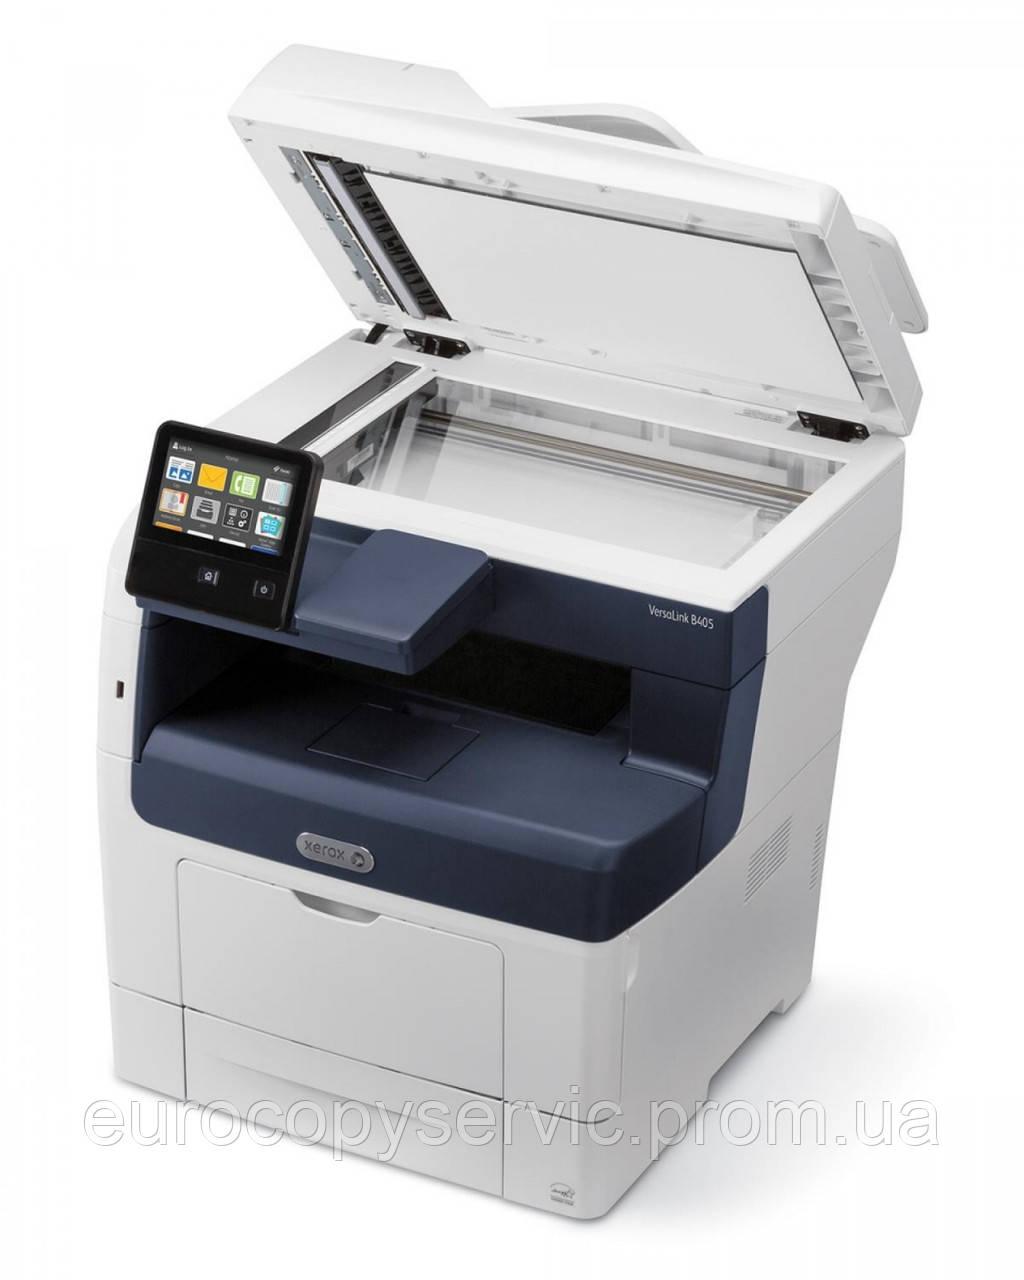 БФП А4 Xerox VersaLink B405 (B405V_DN)